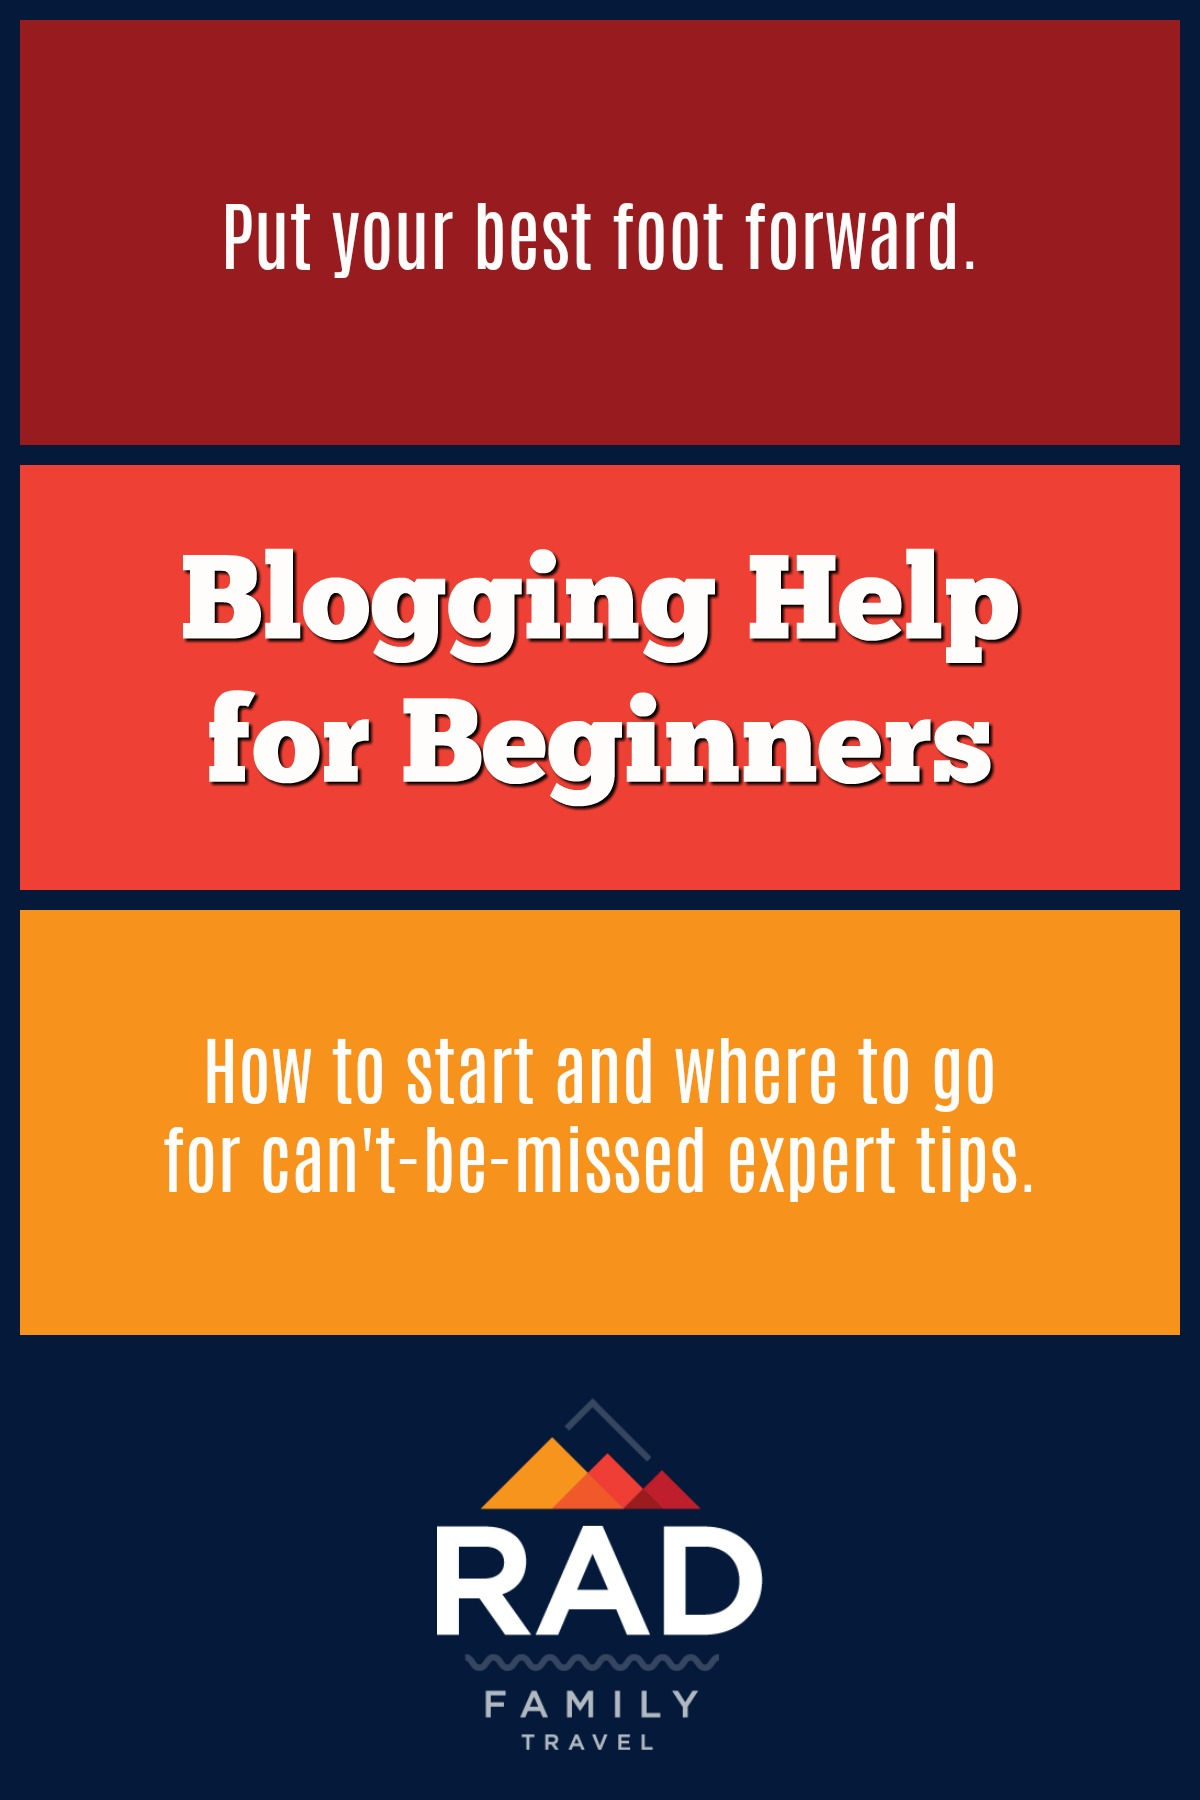 blogging-help-for-beginners